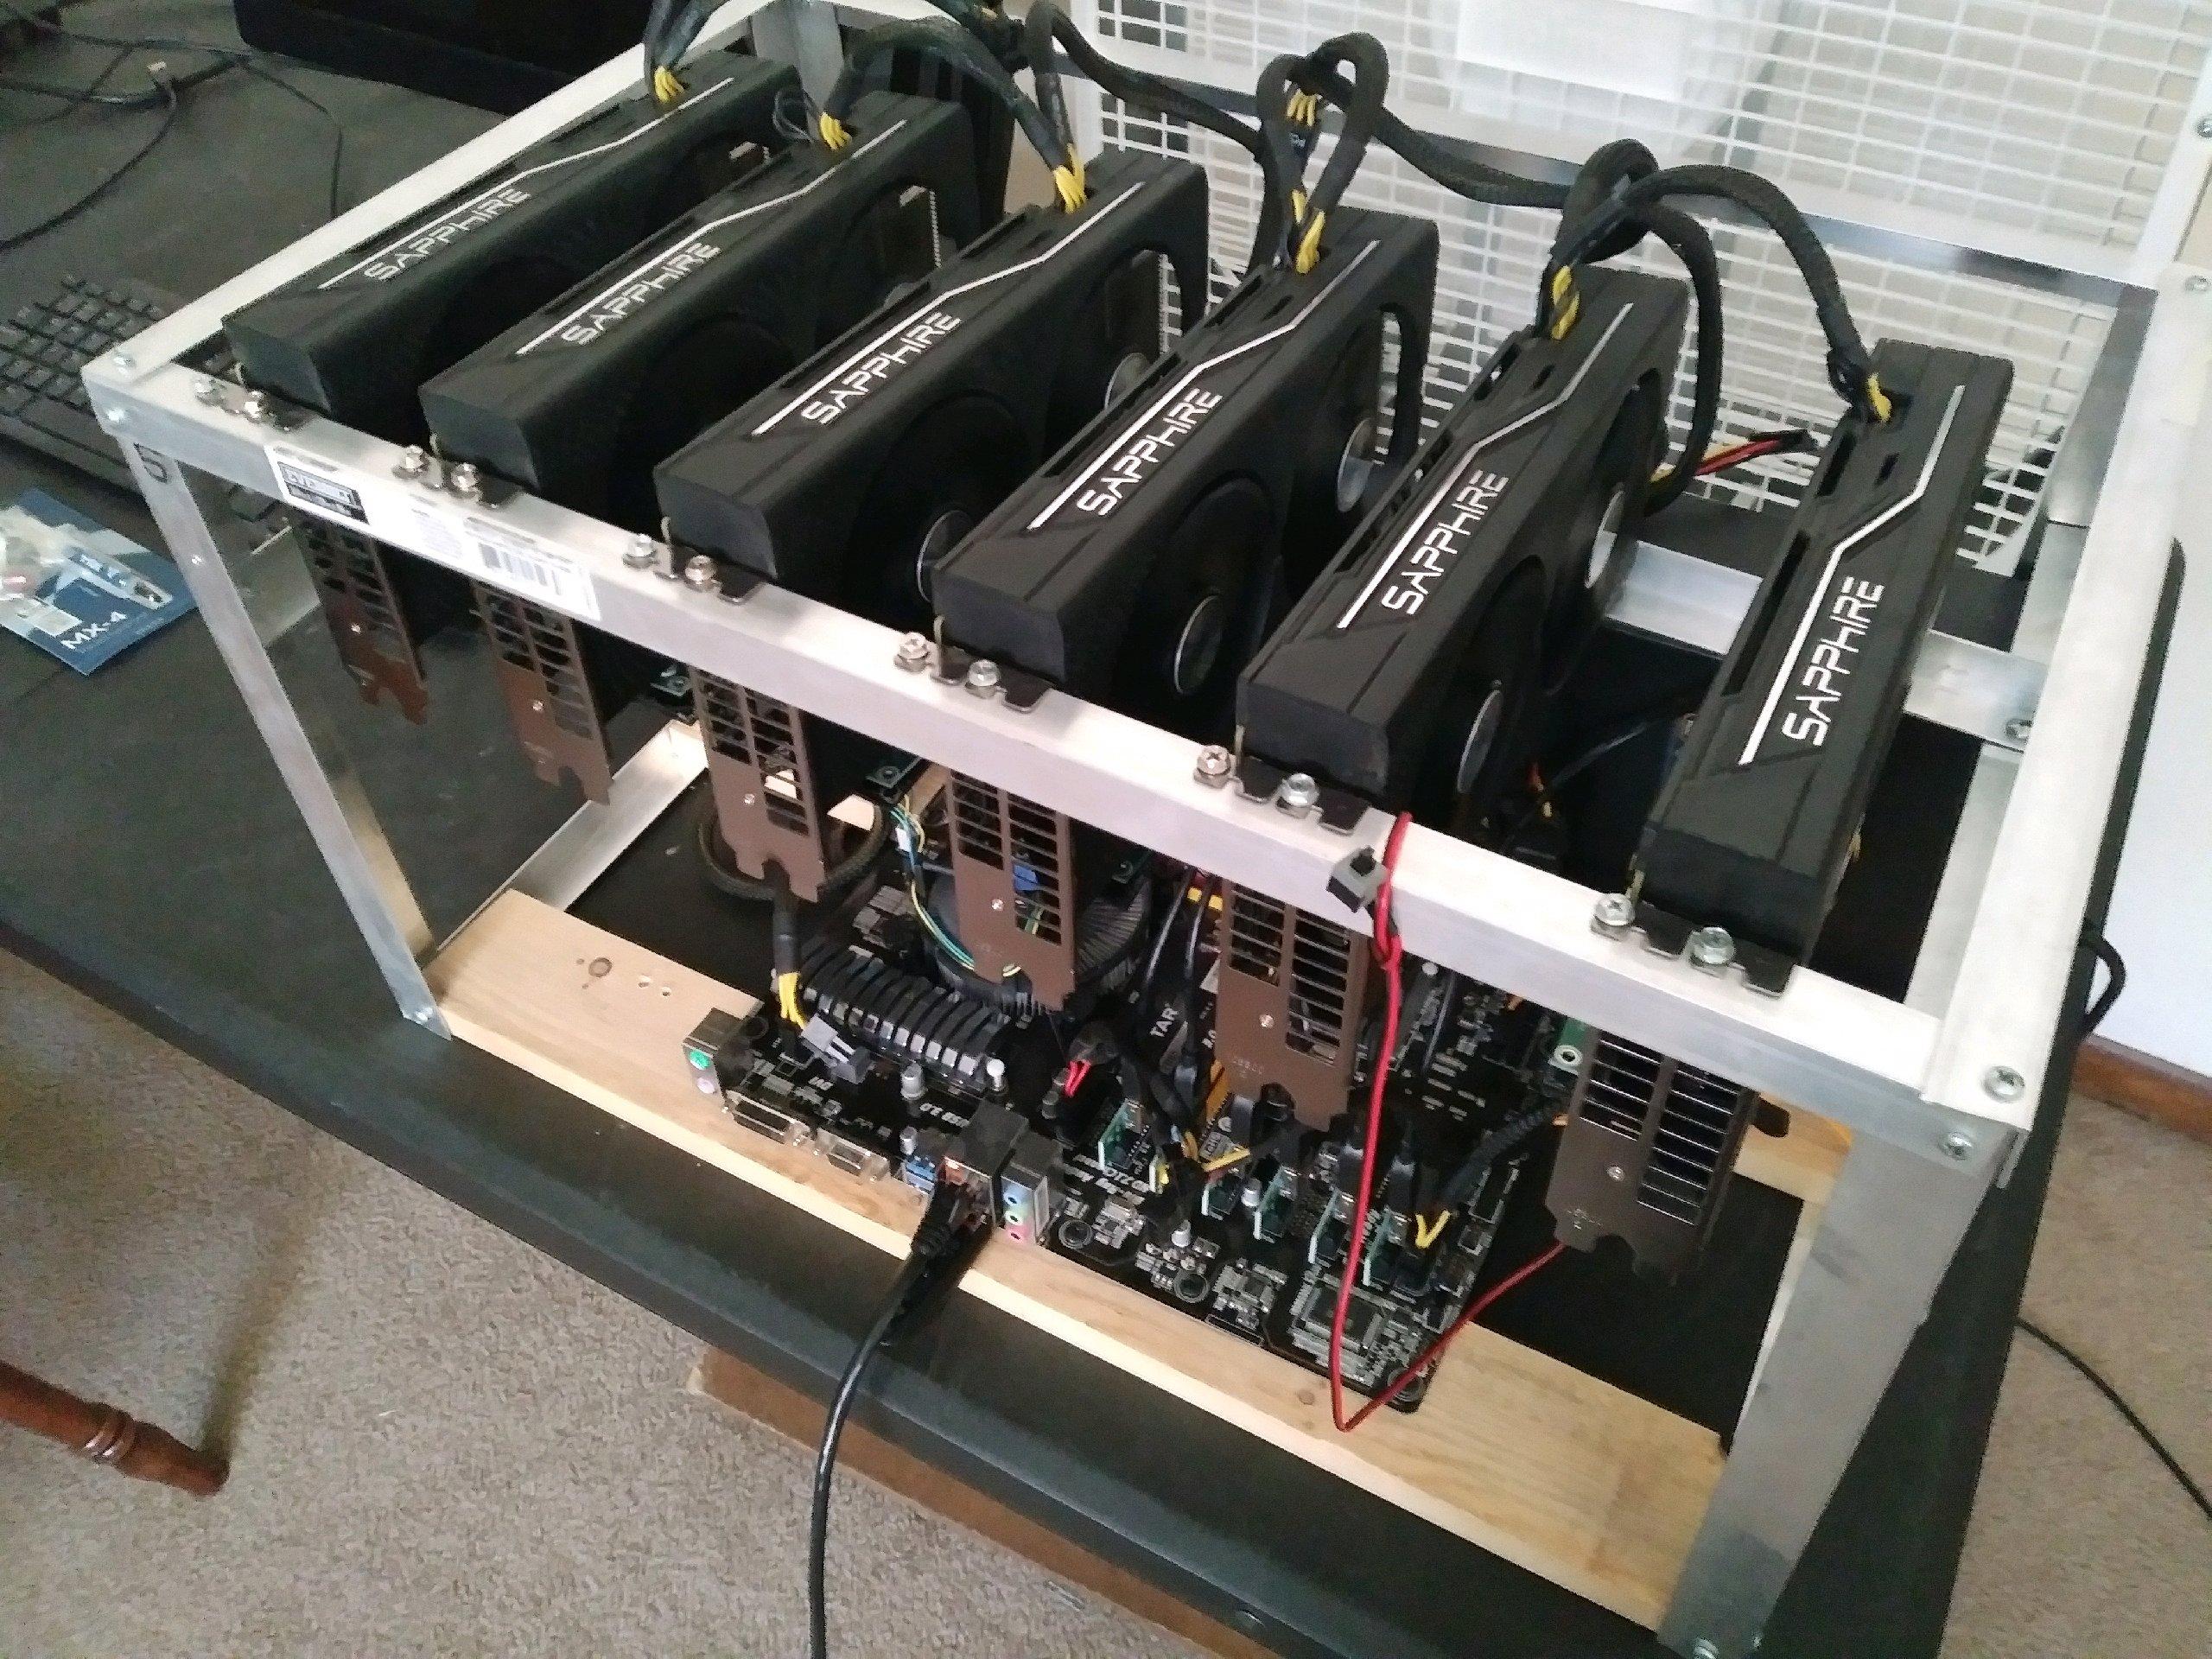 Building AMD Radeon RX 470 6x GPU Mining Rig, Prescott Valley, AZ